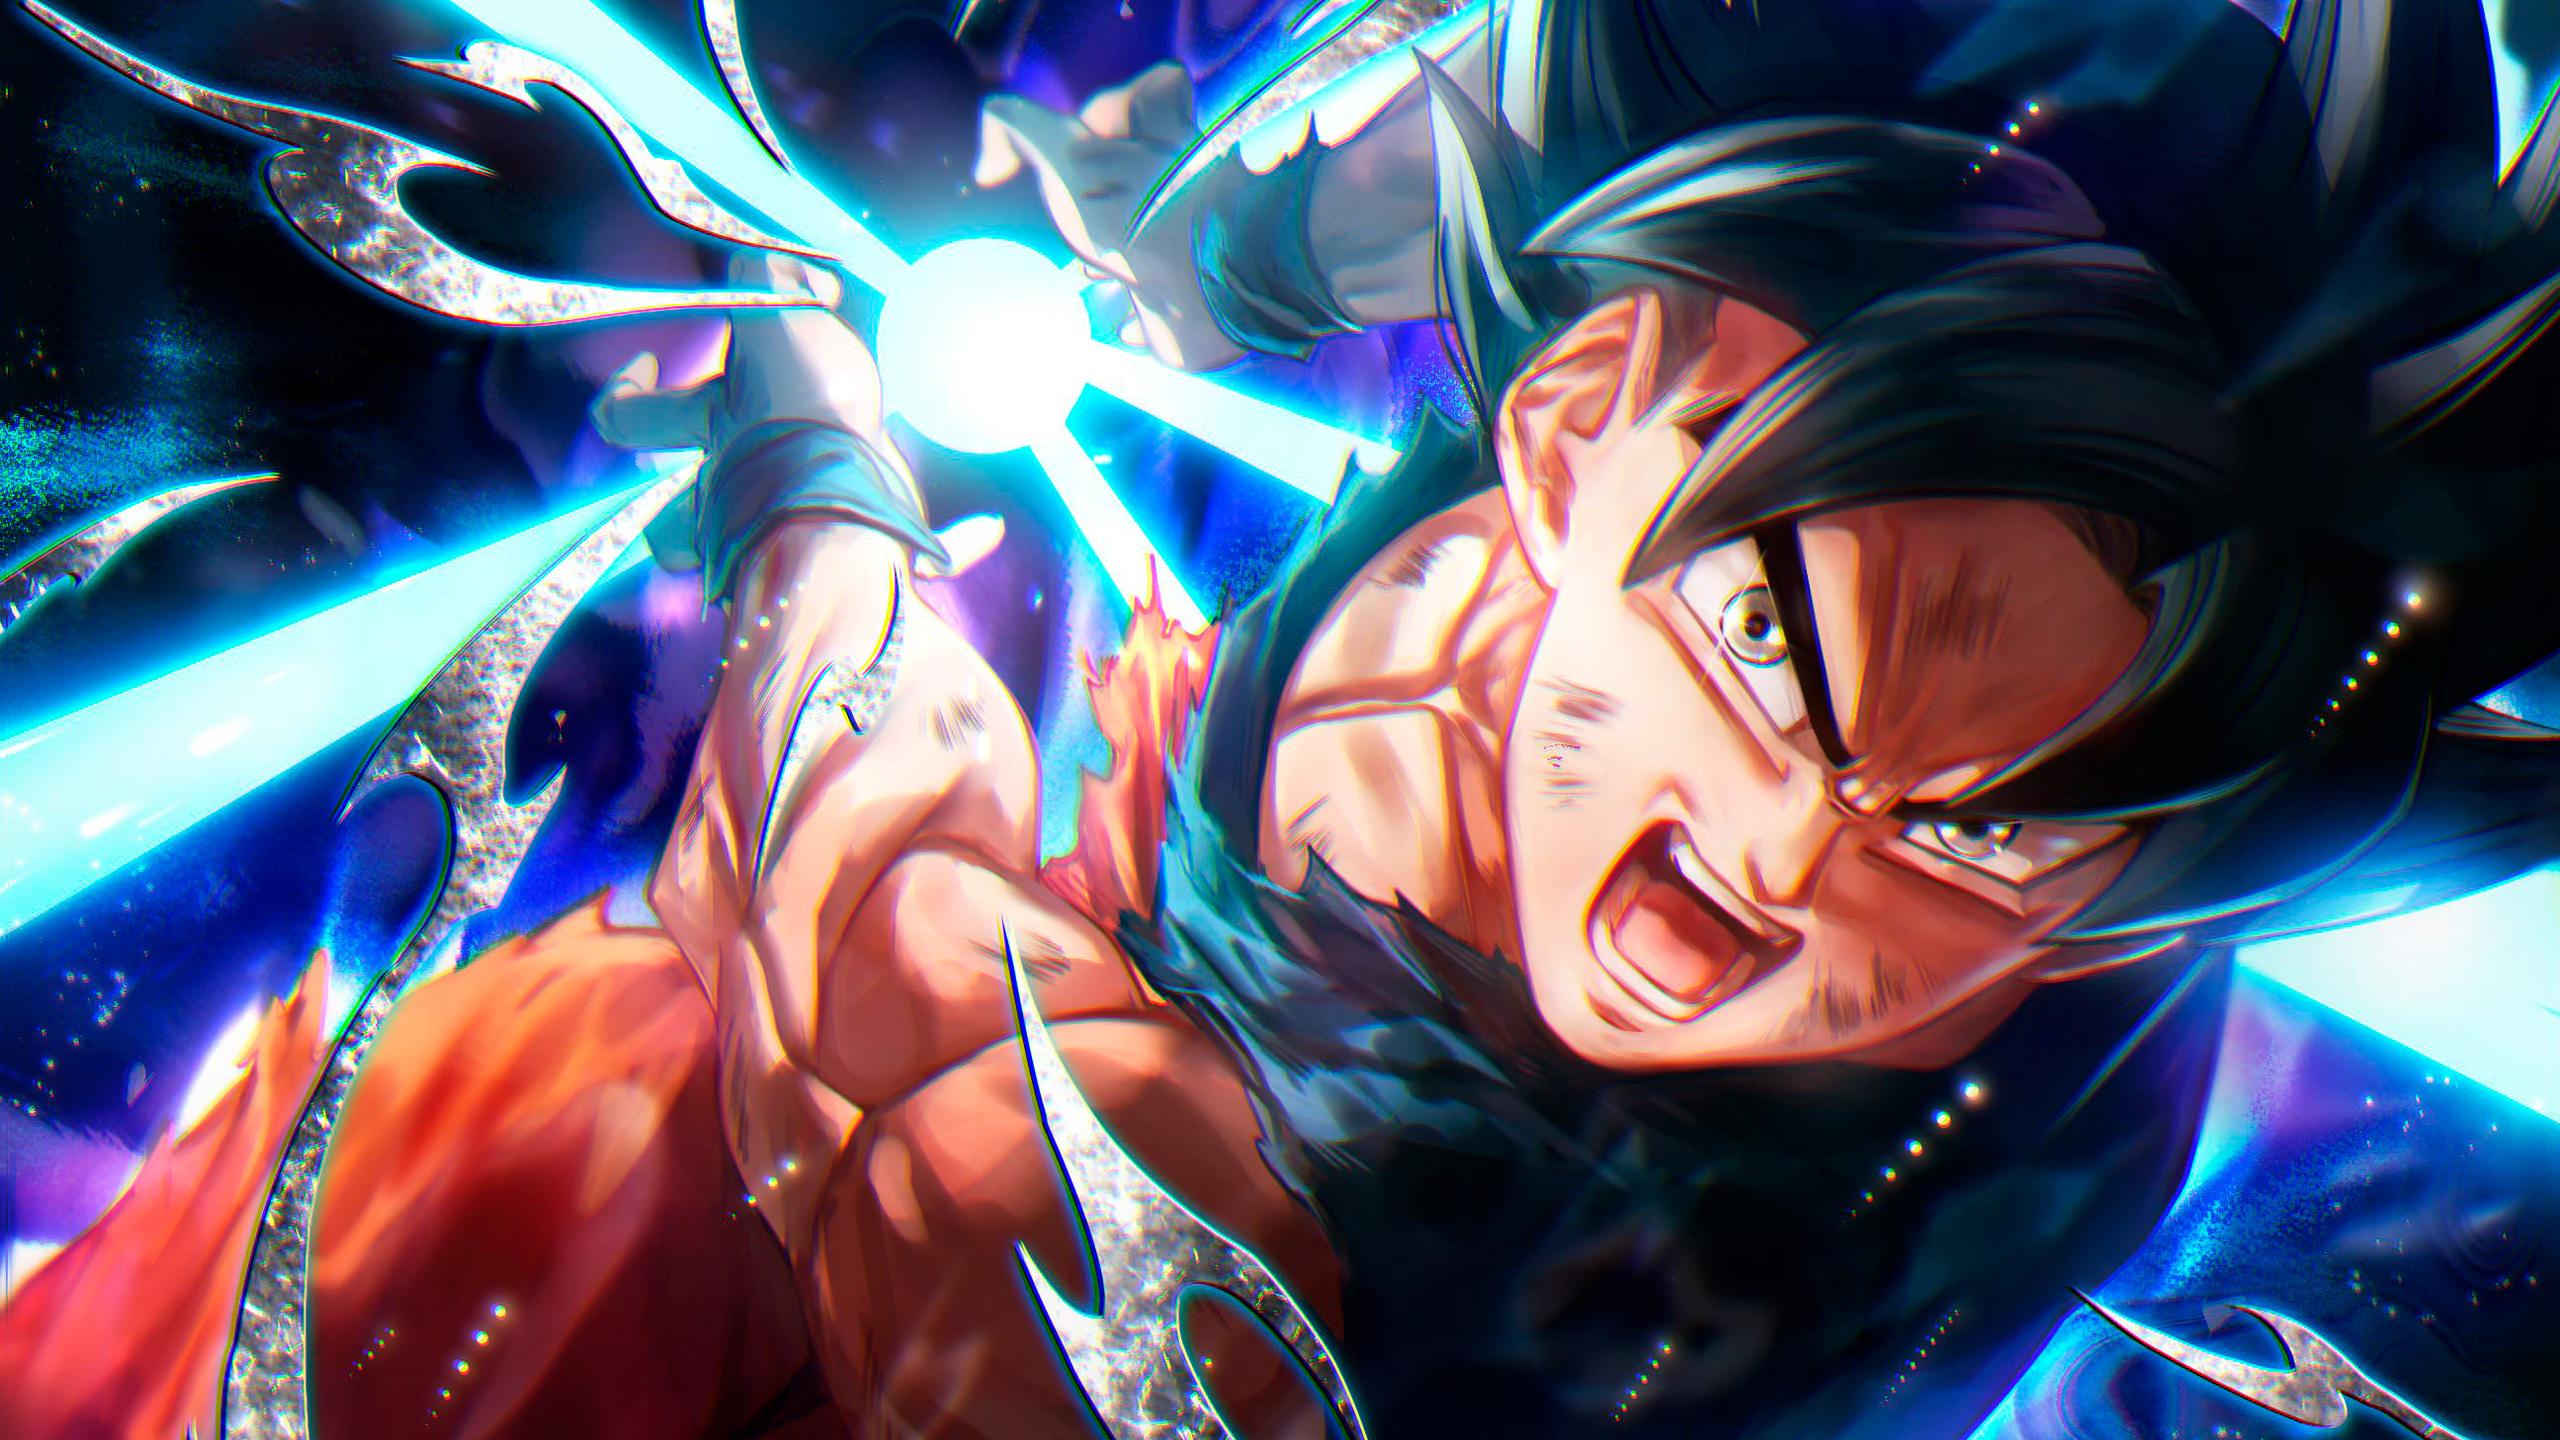 2560x1440 Goku In Dragon Ball Super Anime 4k 1440P ...